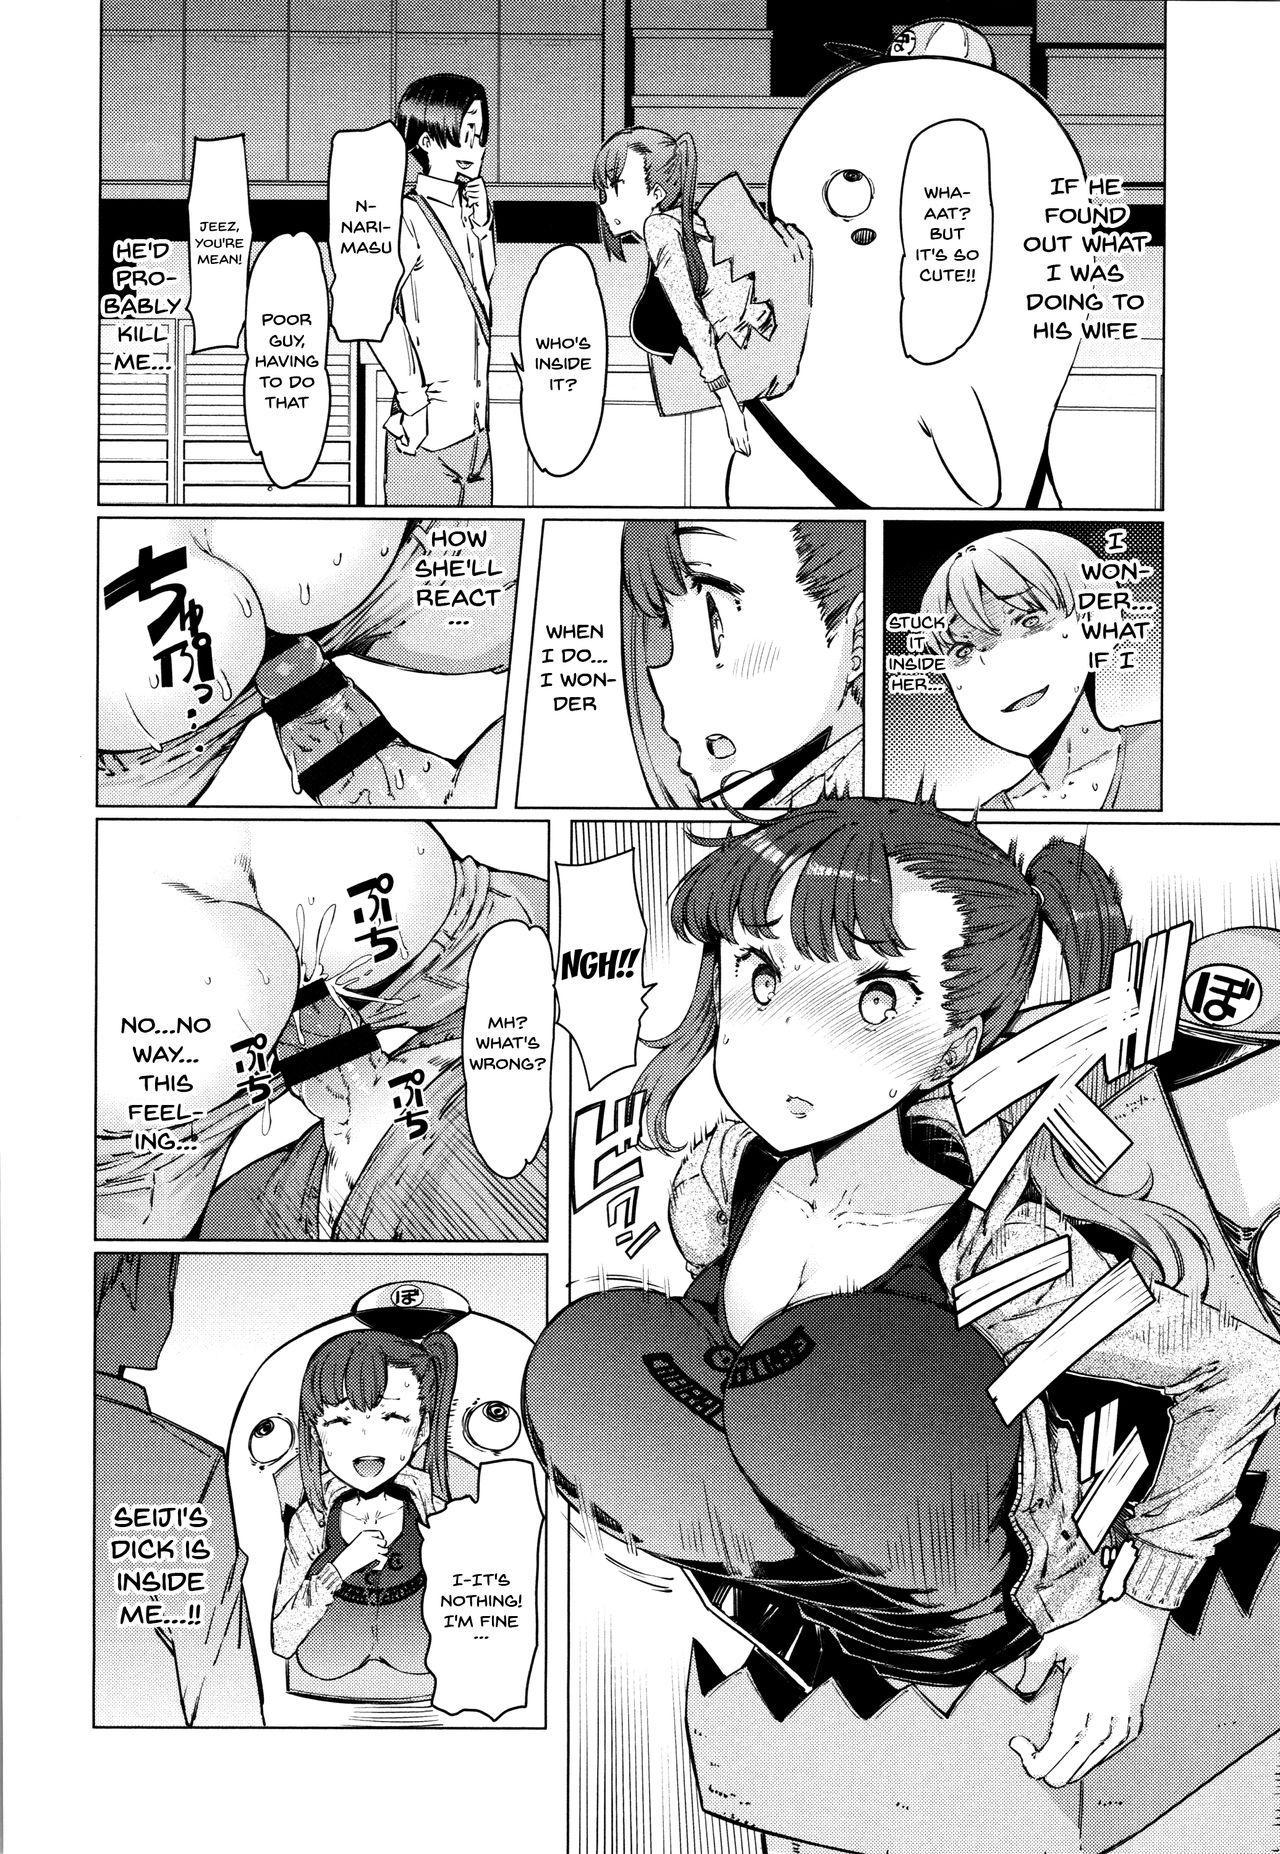 Hitozuma ga Ero Sugite Shigoto ni Naranai! | These Housewives Are Too Lewd I Can't Help It! 27